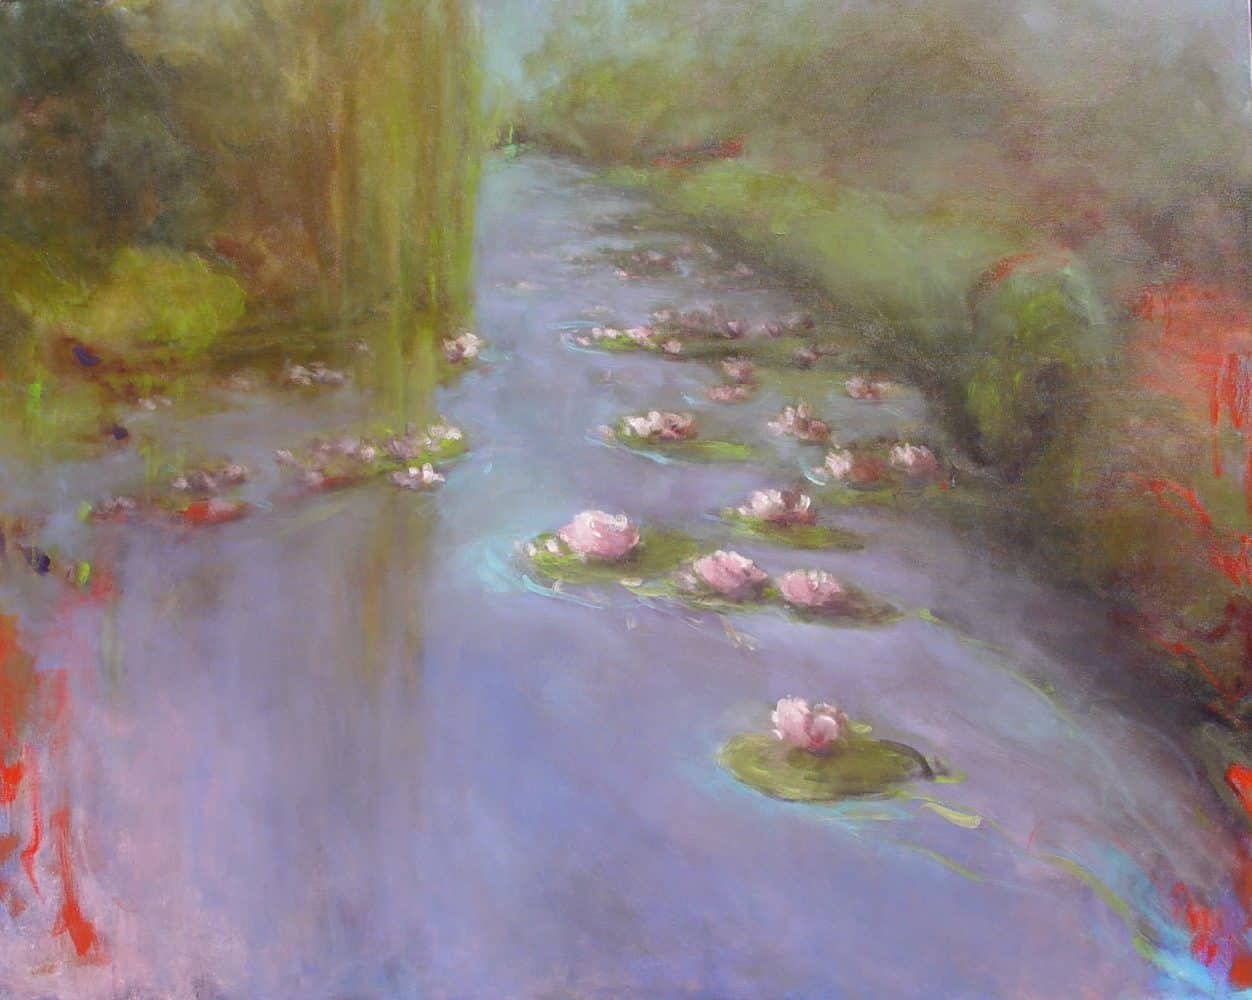 Gallery 187 - Isabelle Delannoy